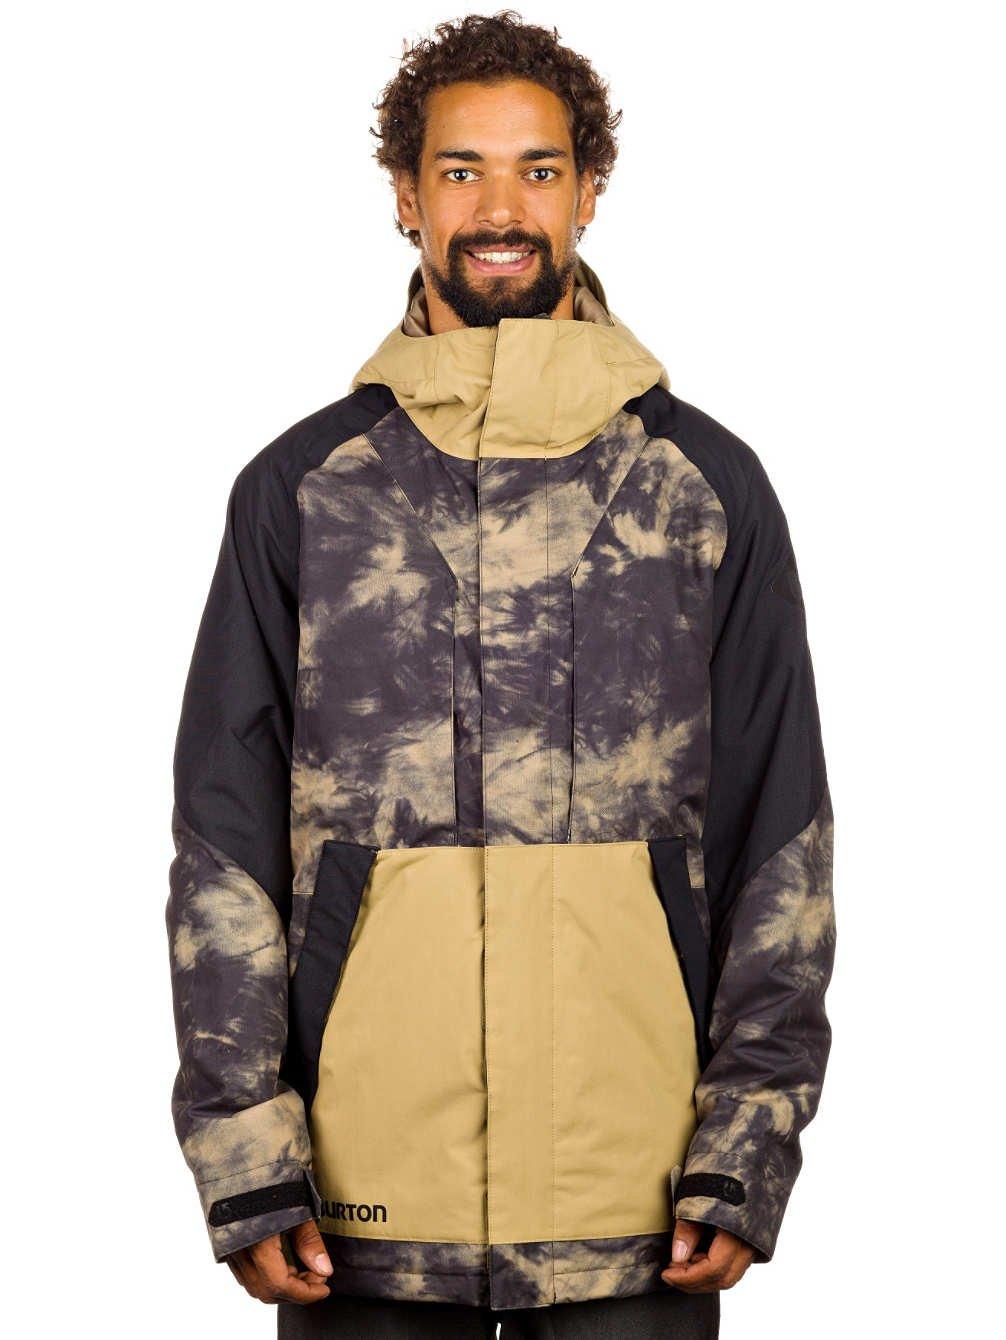 Burton Herren Snowboardjacke MB Haze Varsity Jacket günstig kaufen